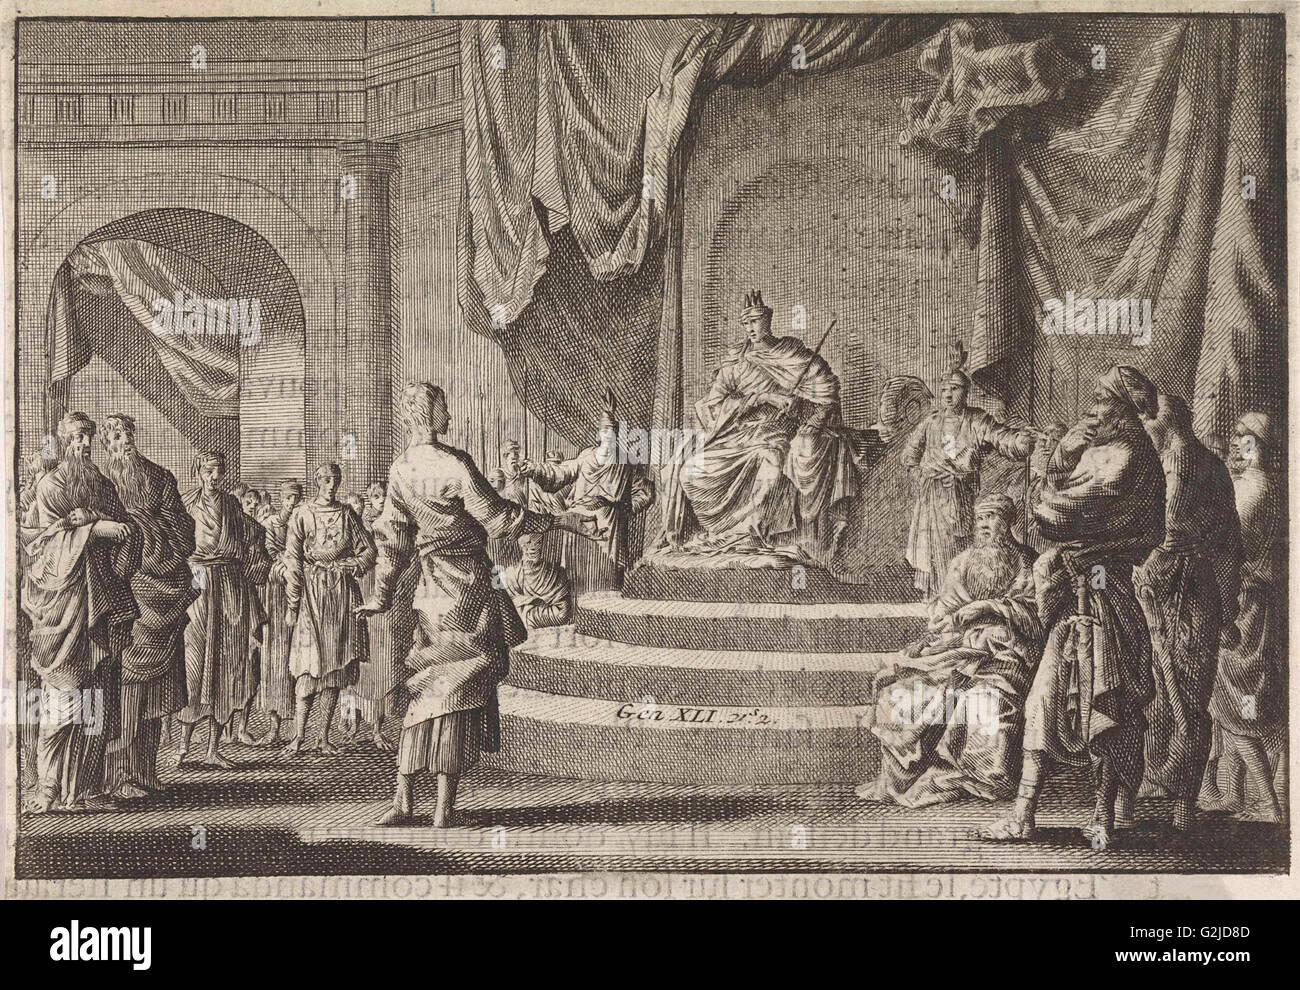 Joseph explains the dreams of the Pharaoh, Jan Luyken, Pieter Mortier, 1703 - 1762 - Stock Image